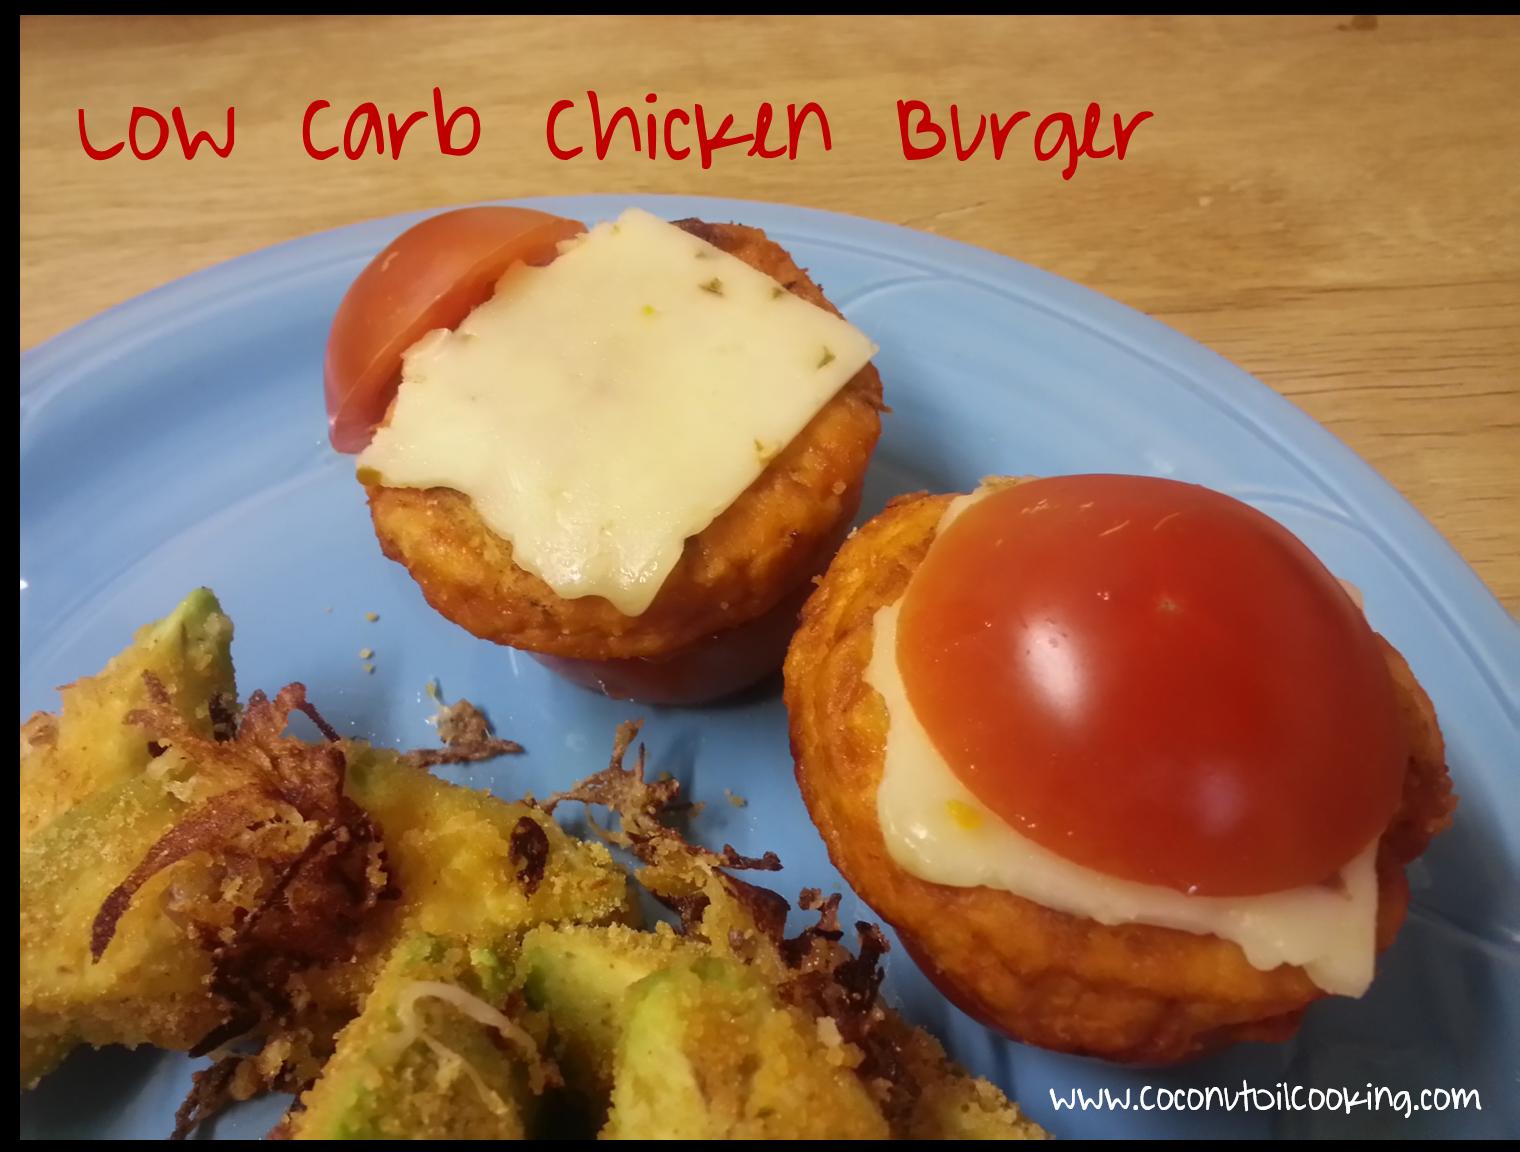 Low Carb Buffalo Chicken Burger